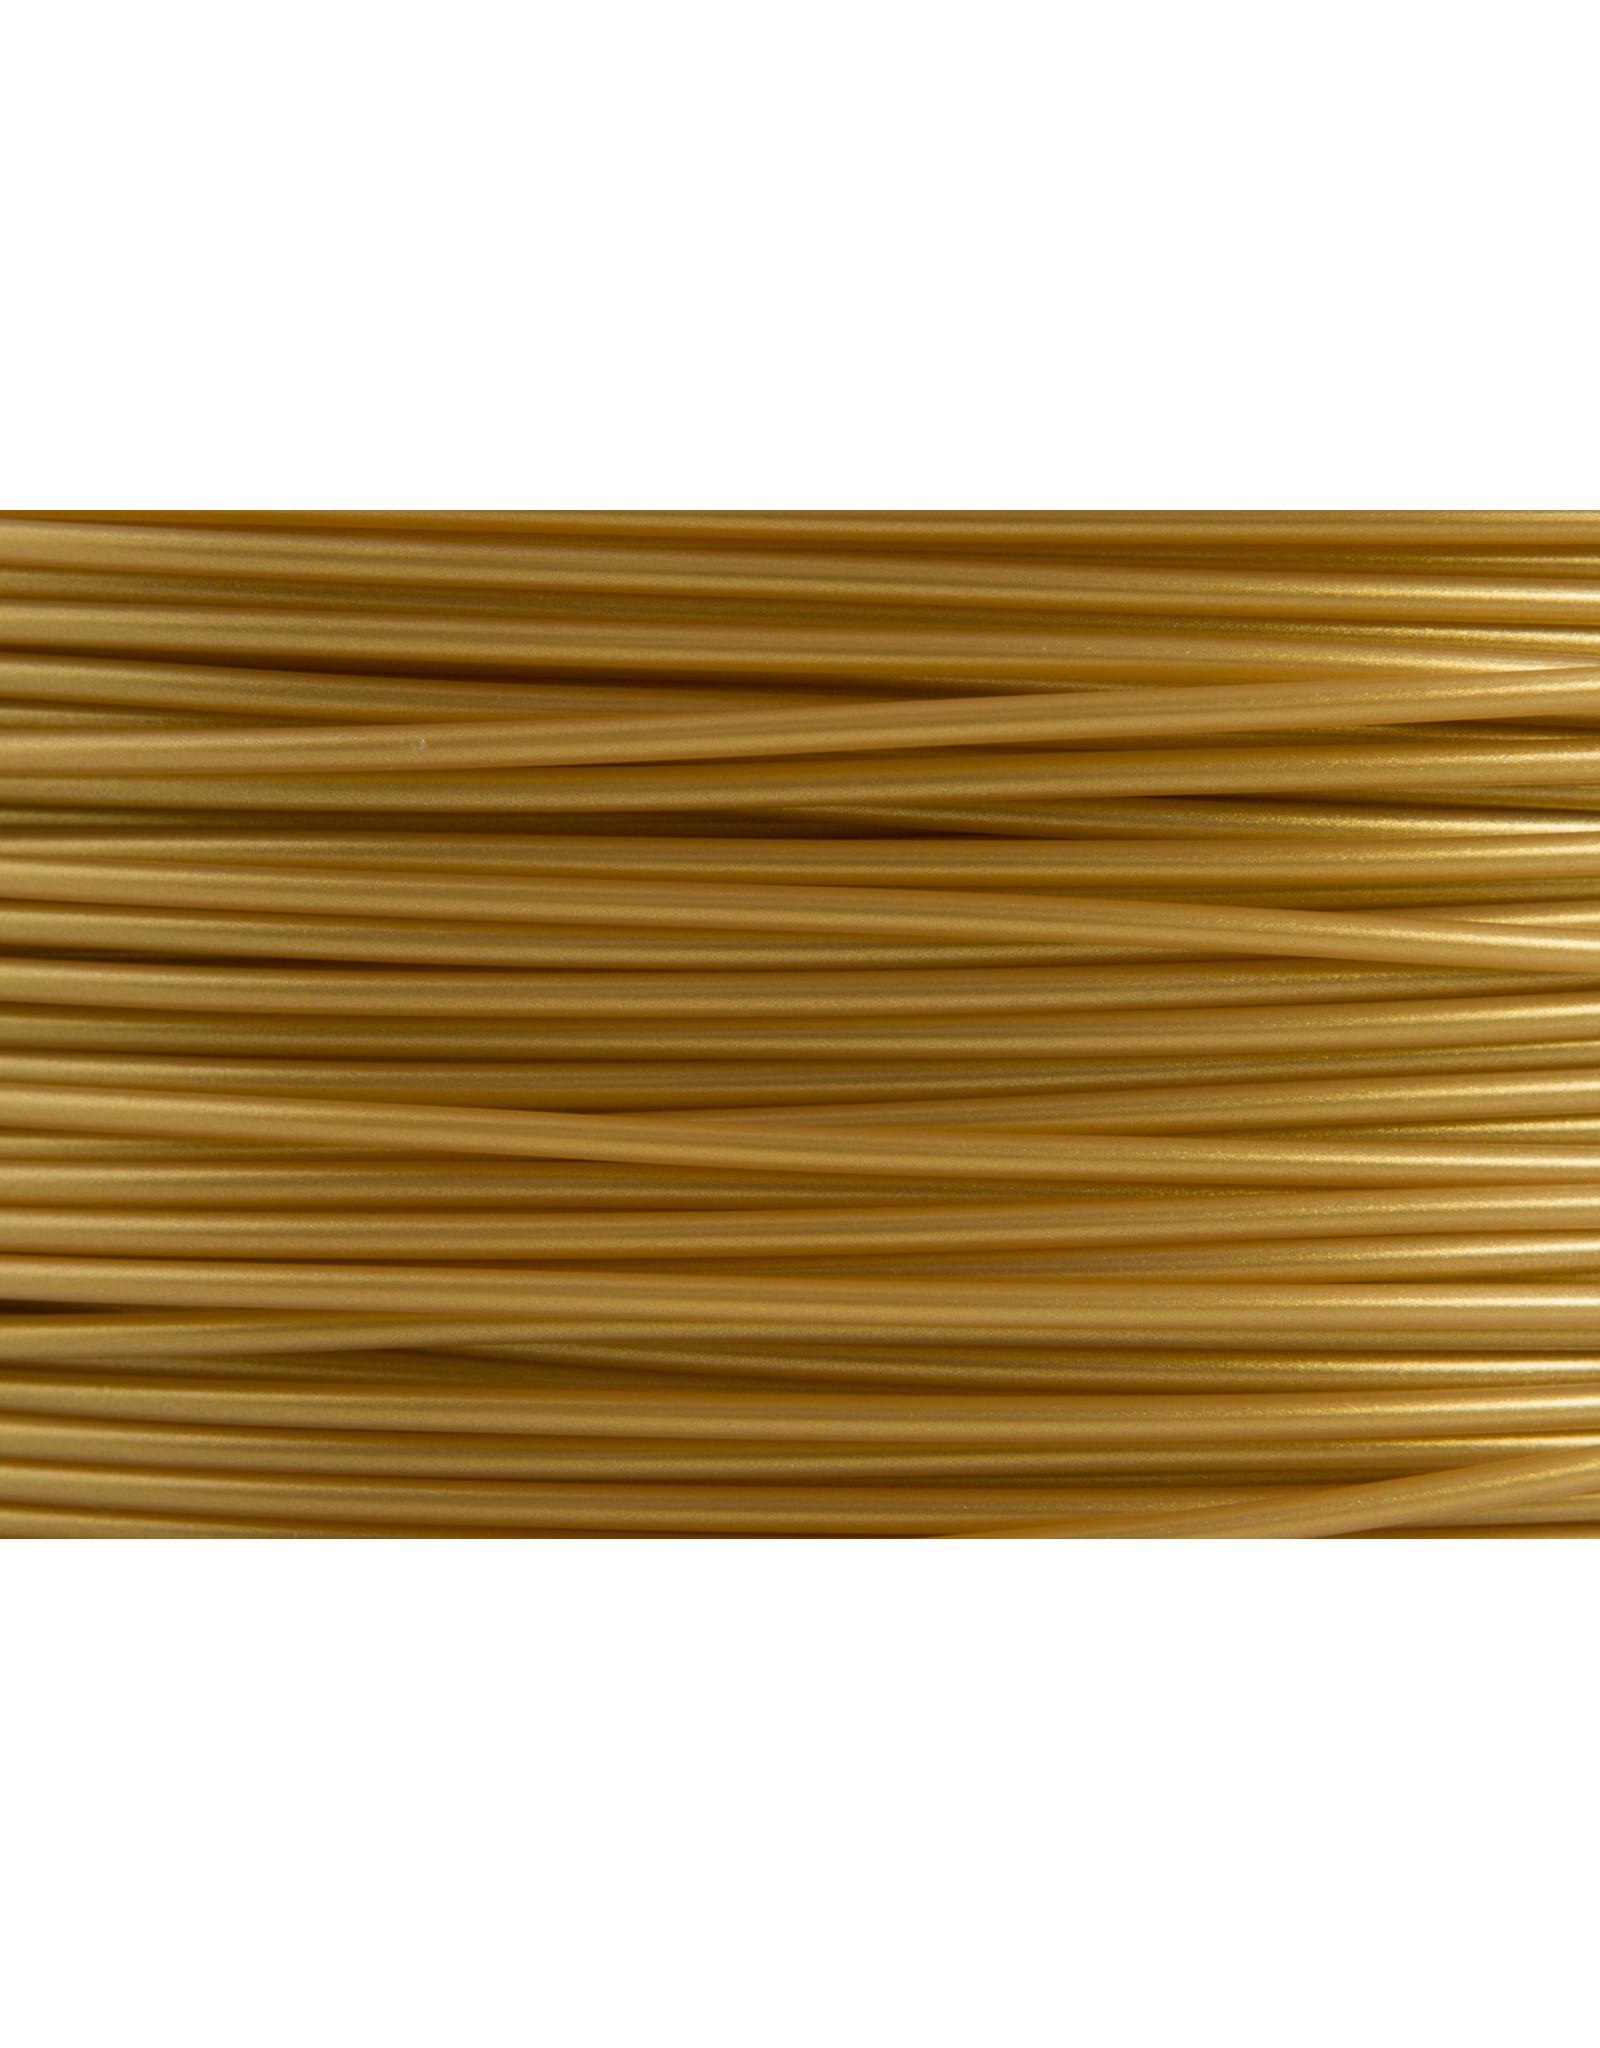 Prima PrimaSelect PLA 1.75mm - 750gr Gold